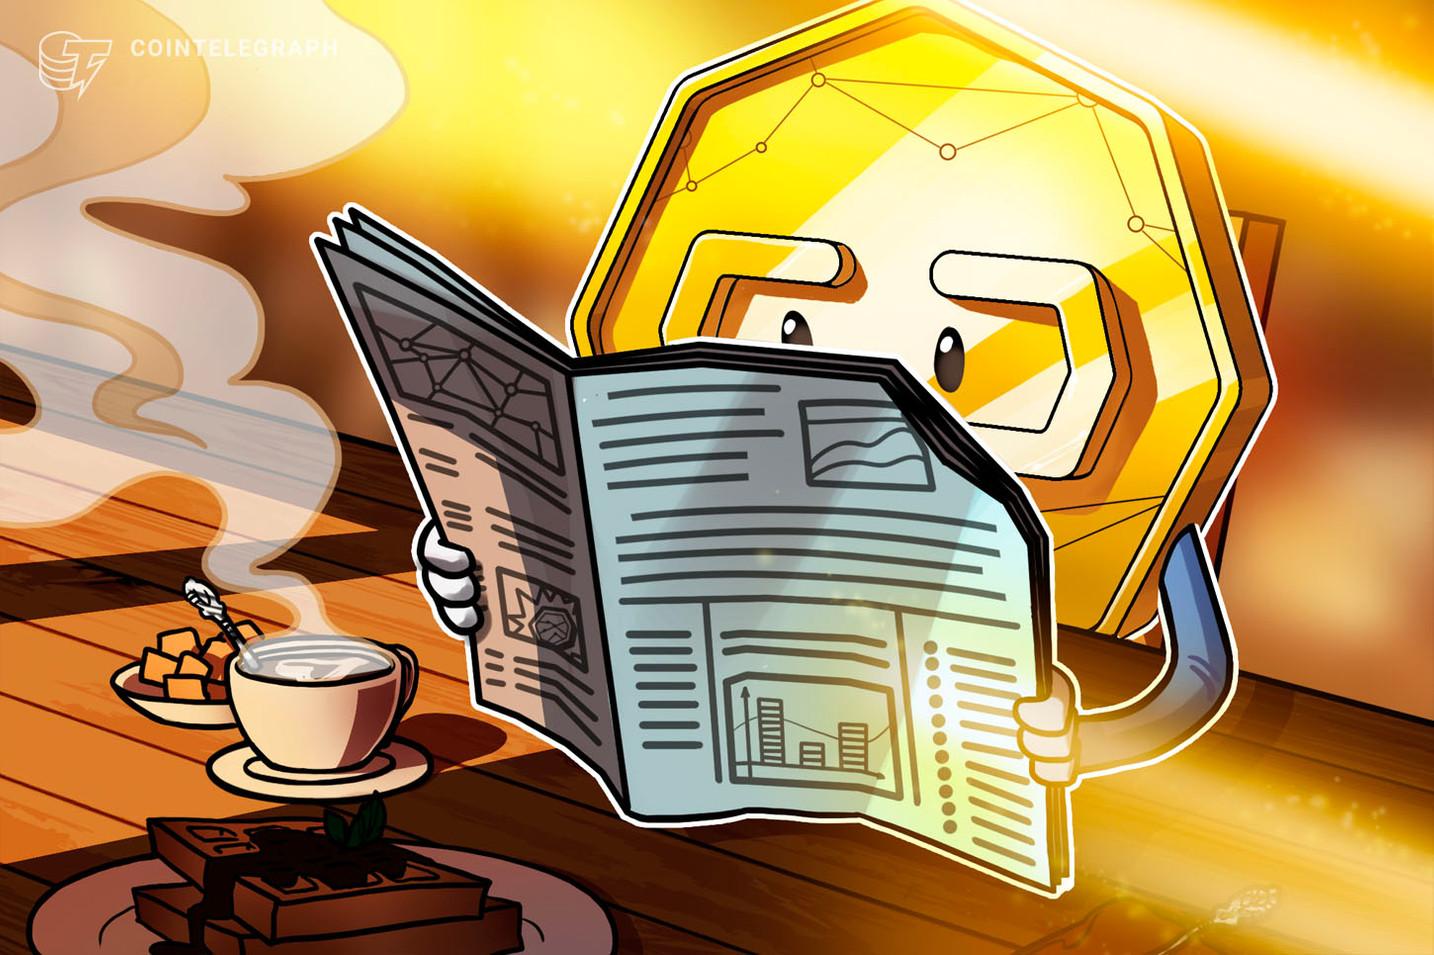 MakerDAO disolverá Foundation y volverá a descentralizarse verdaderamente